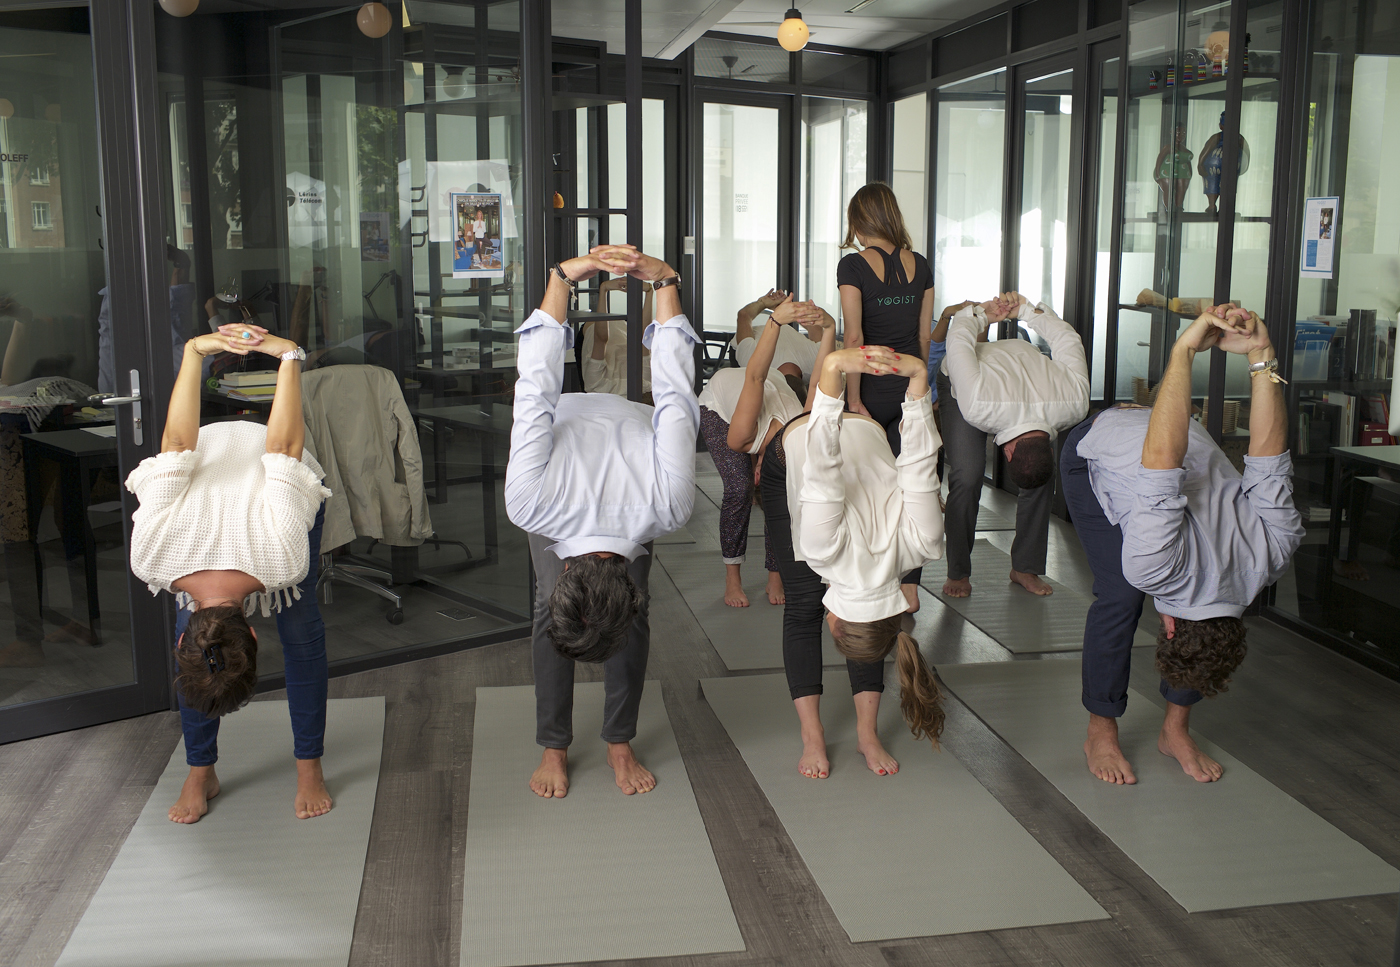 Yogist - Yoga en entreprise sur tapis